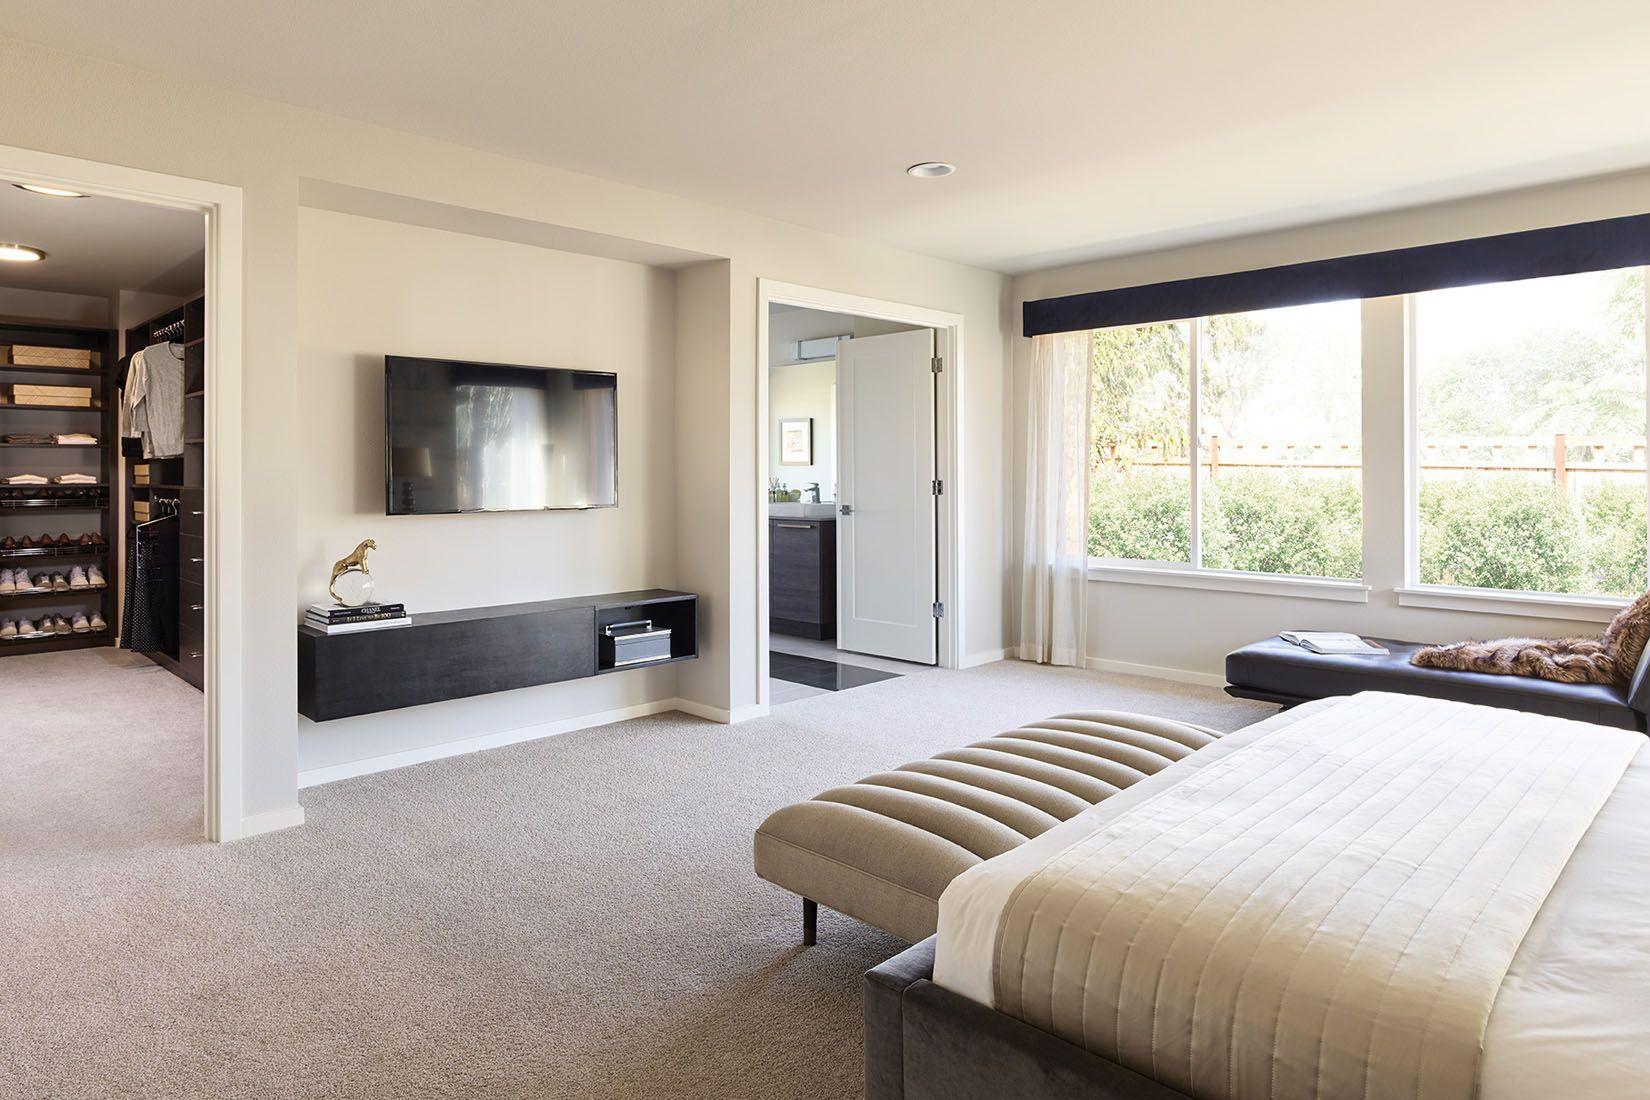 Stylish Master Bedroom Design Oversized Dressing Room And Double Doors Into Master Bath By M Stylish Master